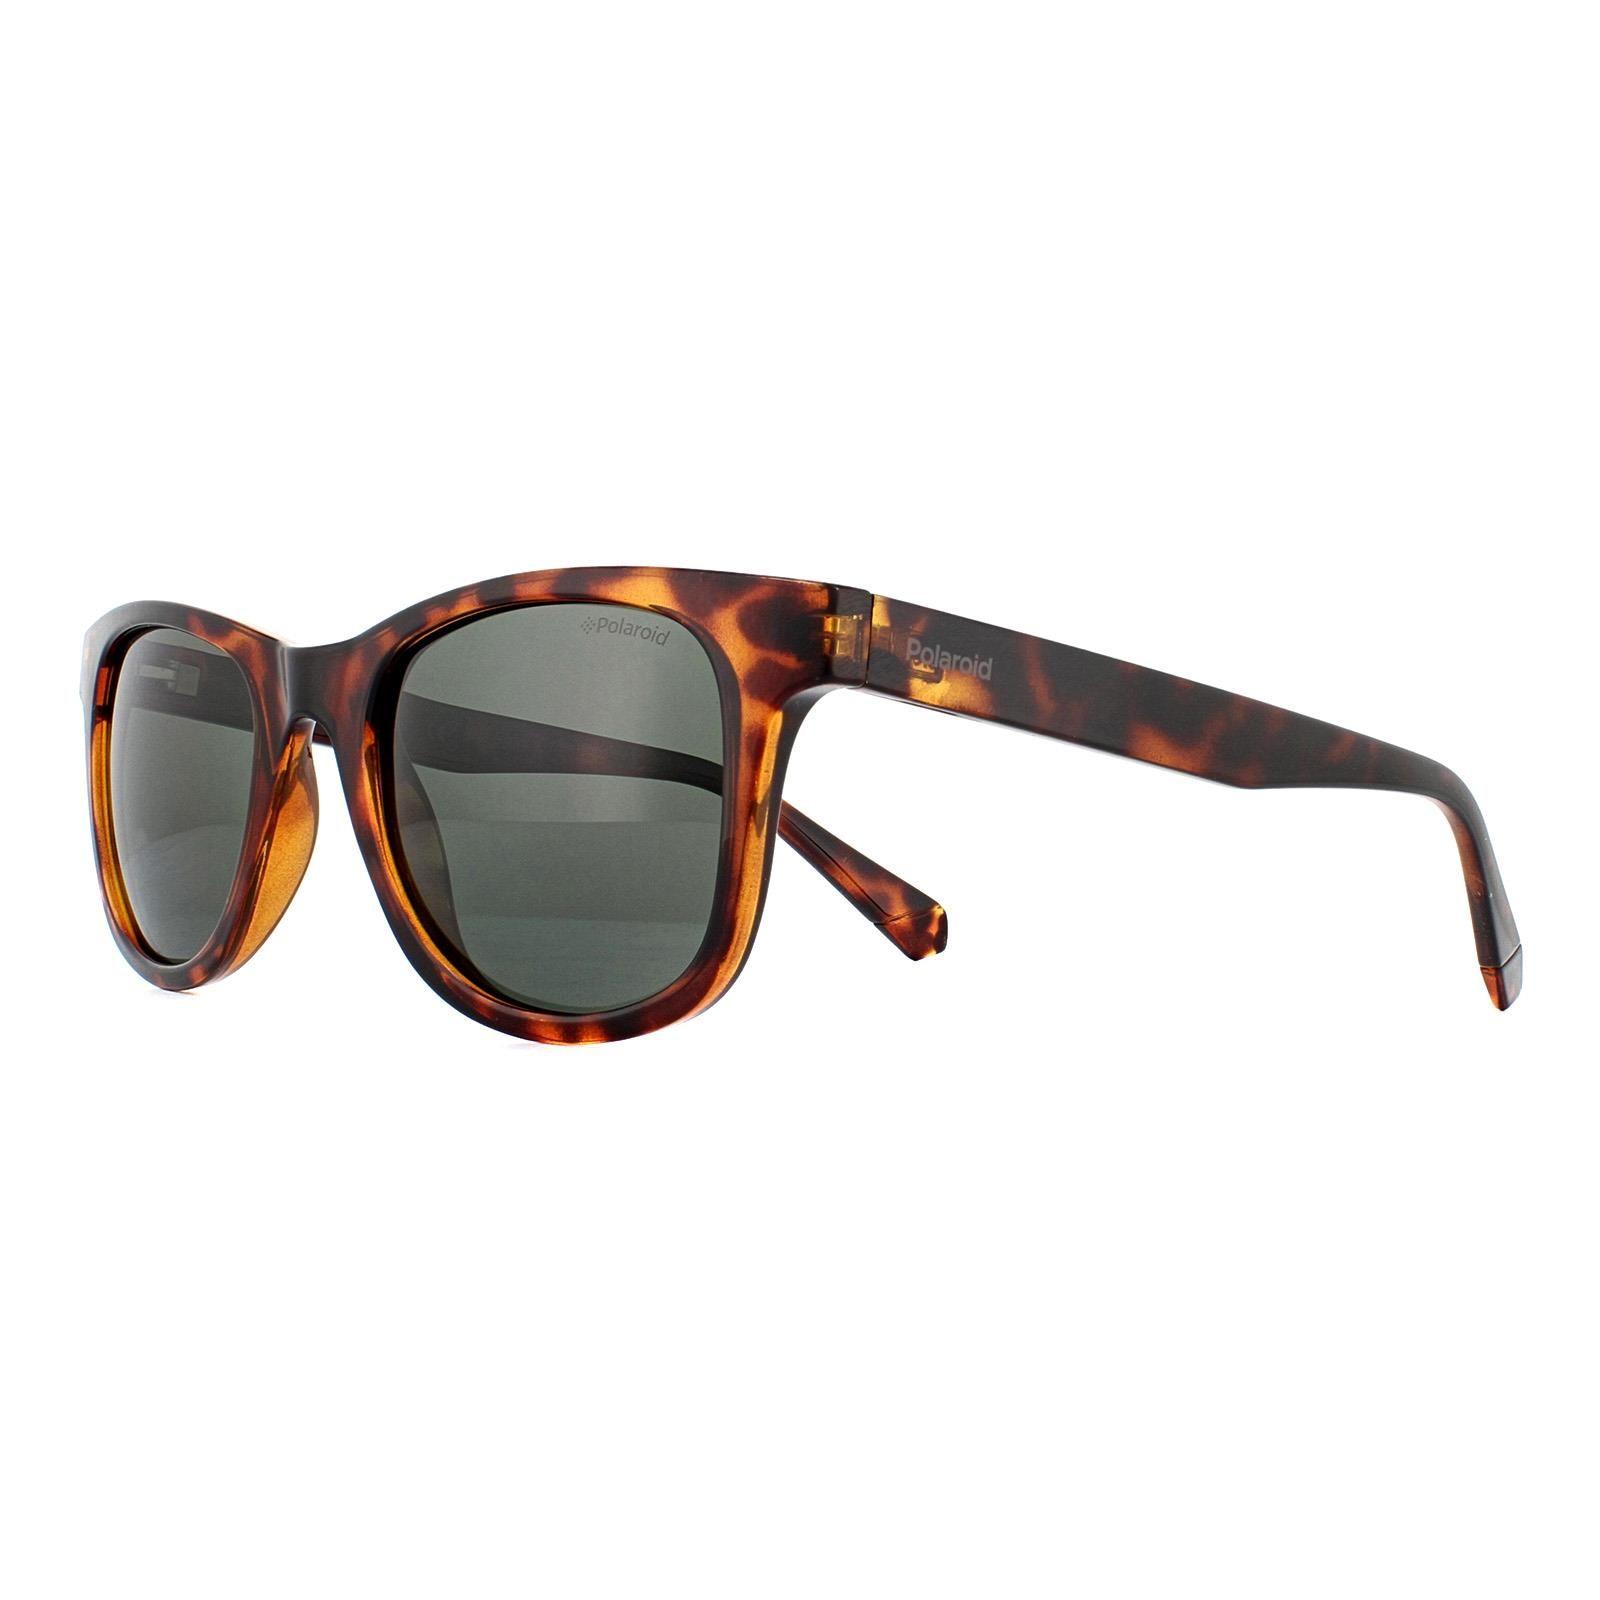 Polaroid Sunglasses PLD 1016/S/NEW 086 UC Dark Havana Green Polarized